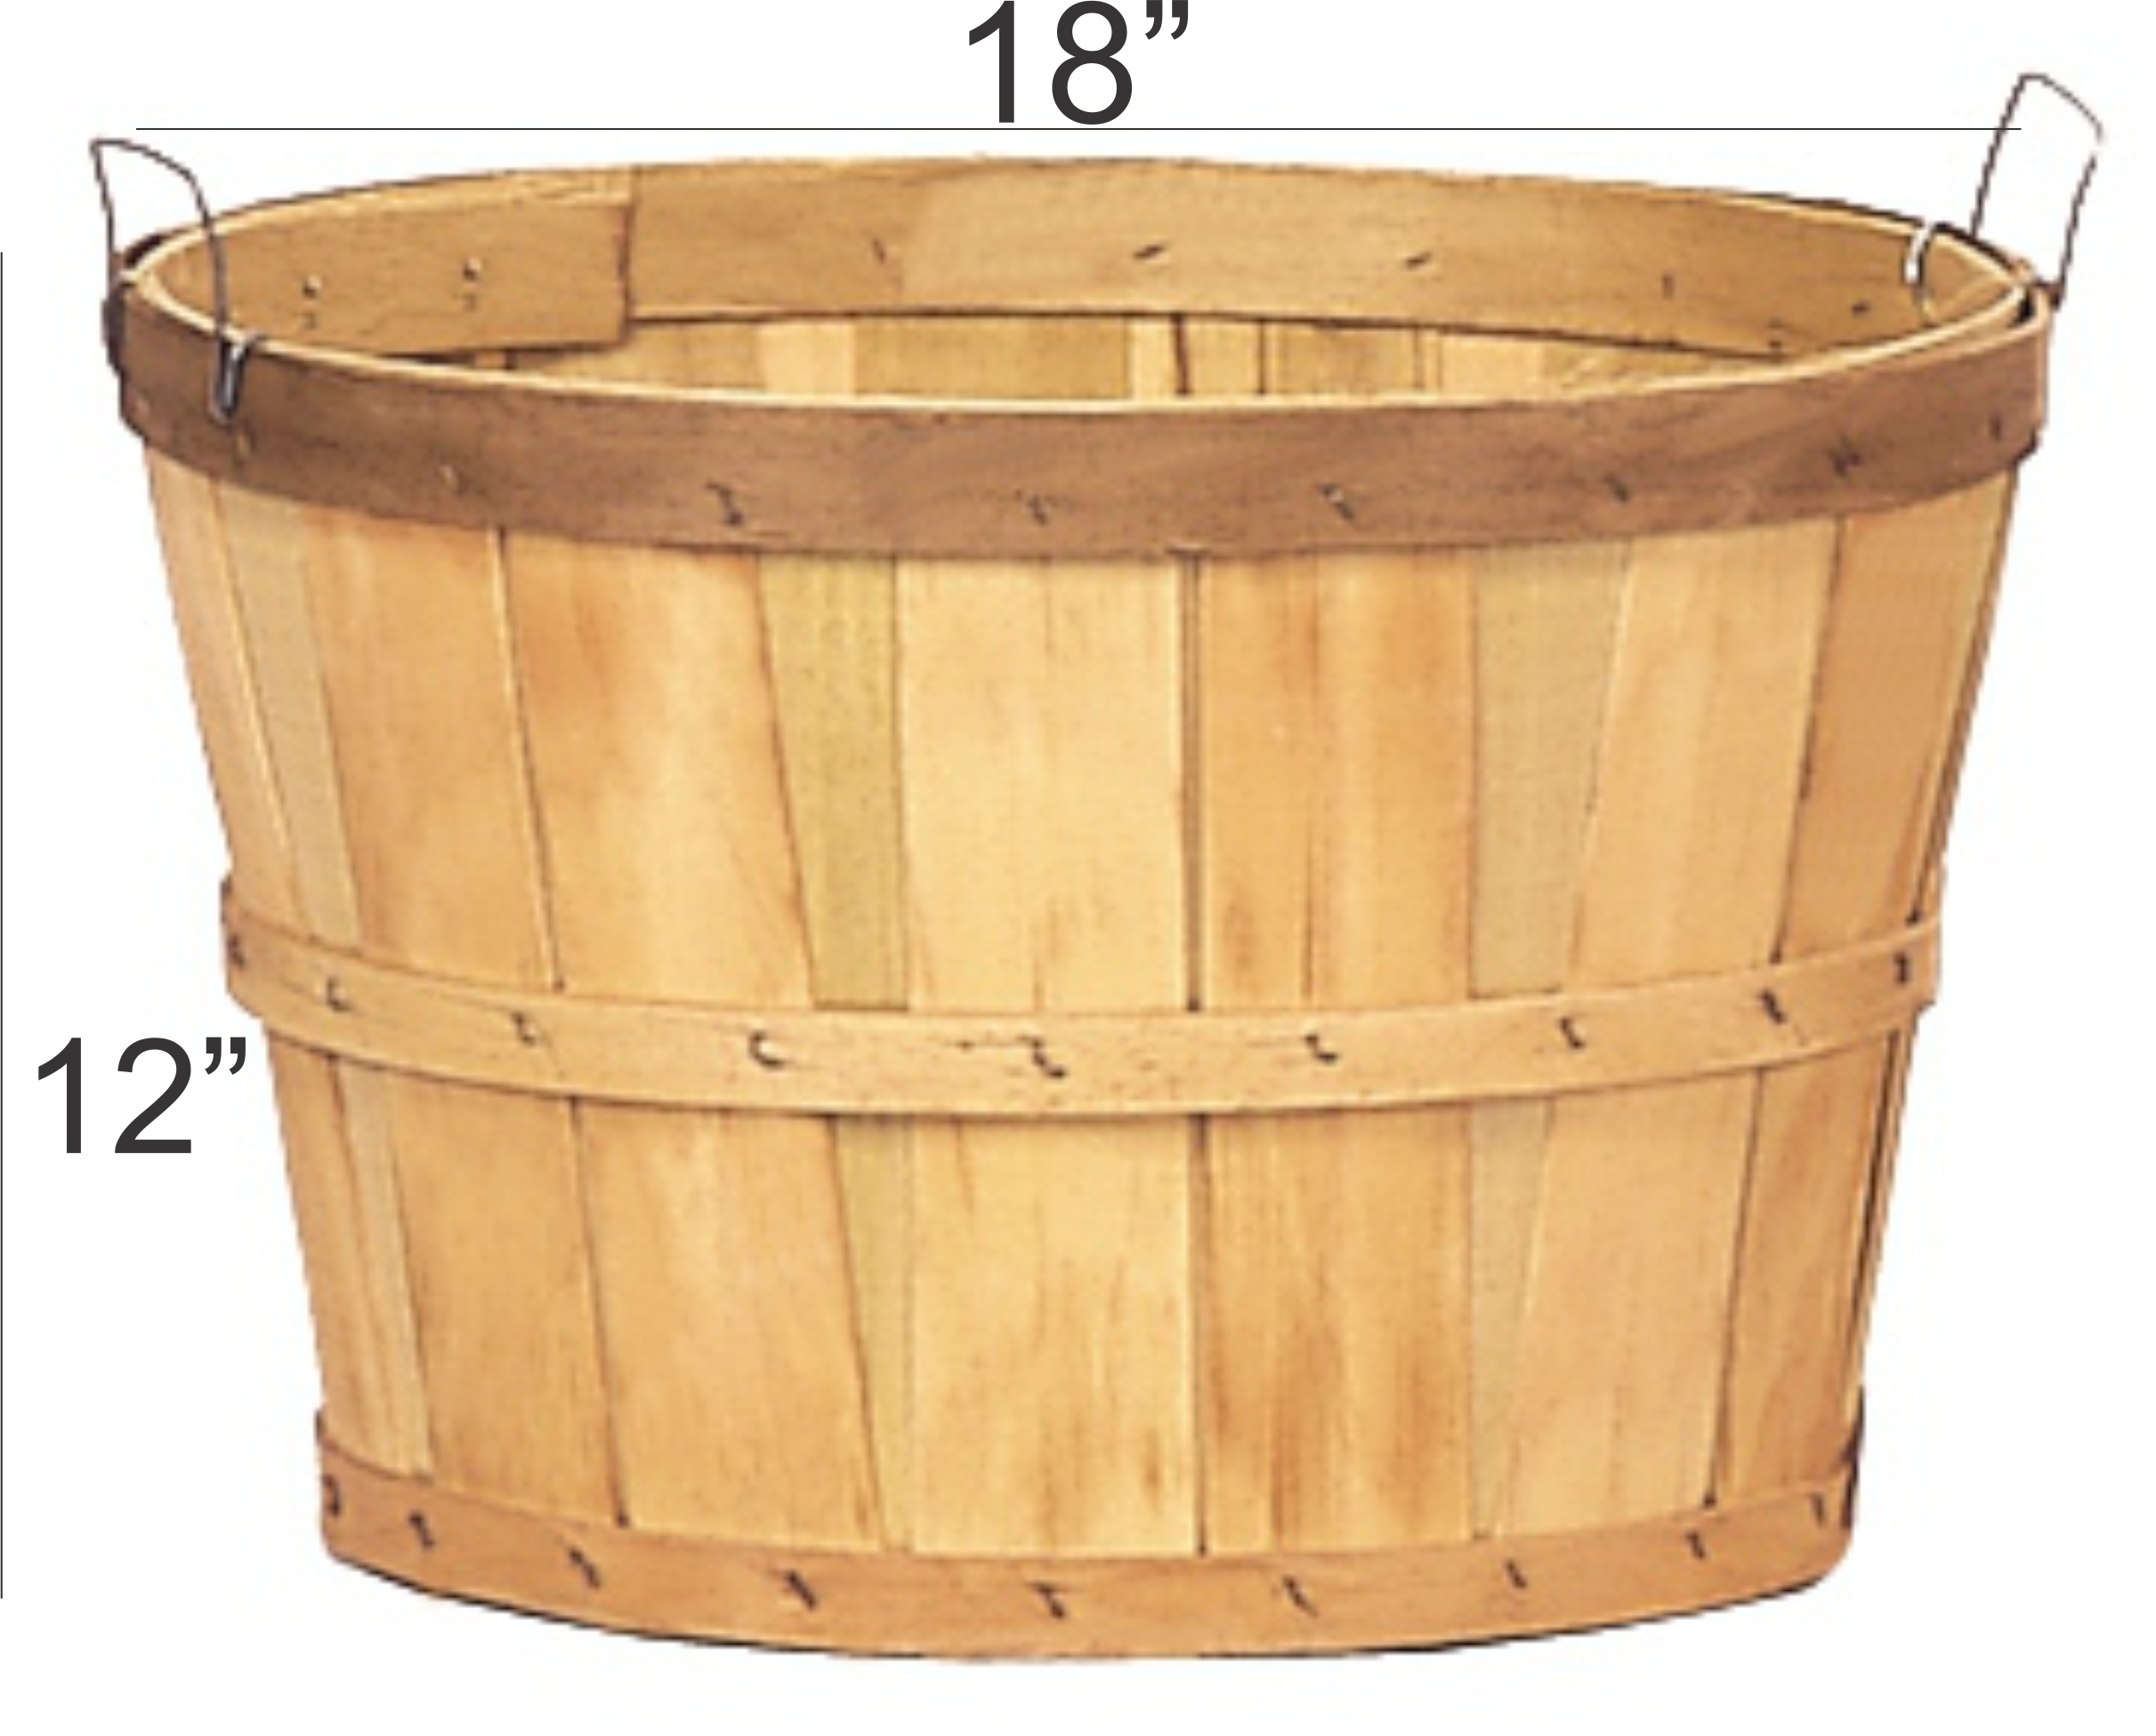 wire handle one bushel baskets